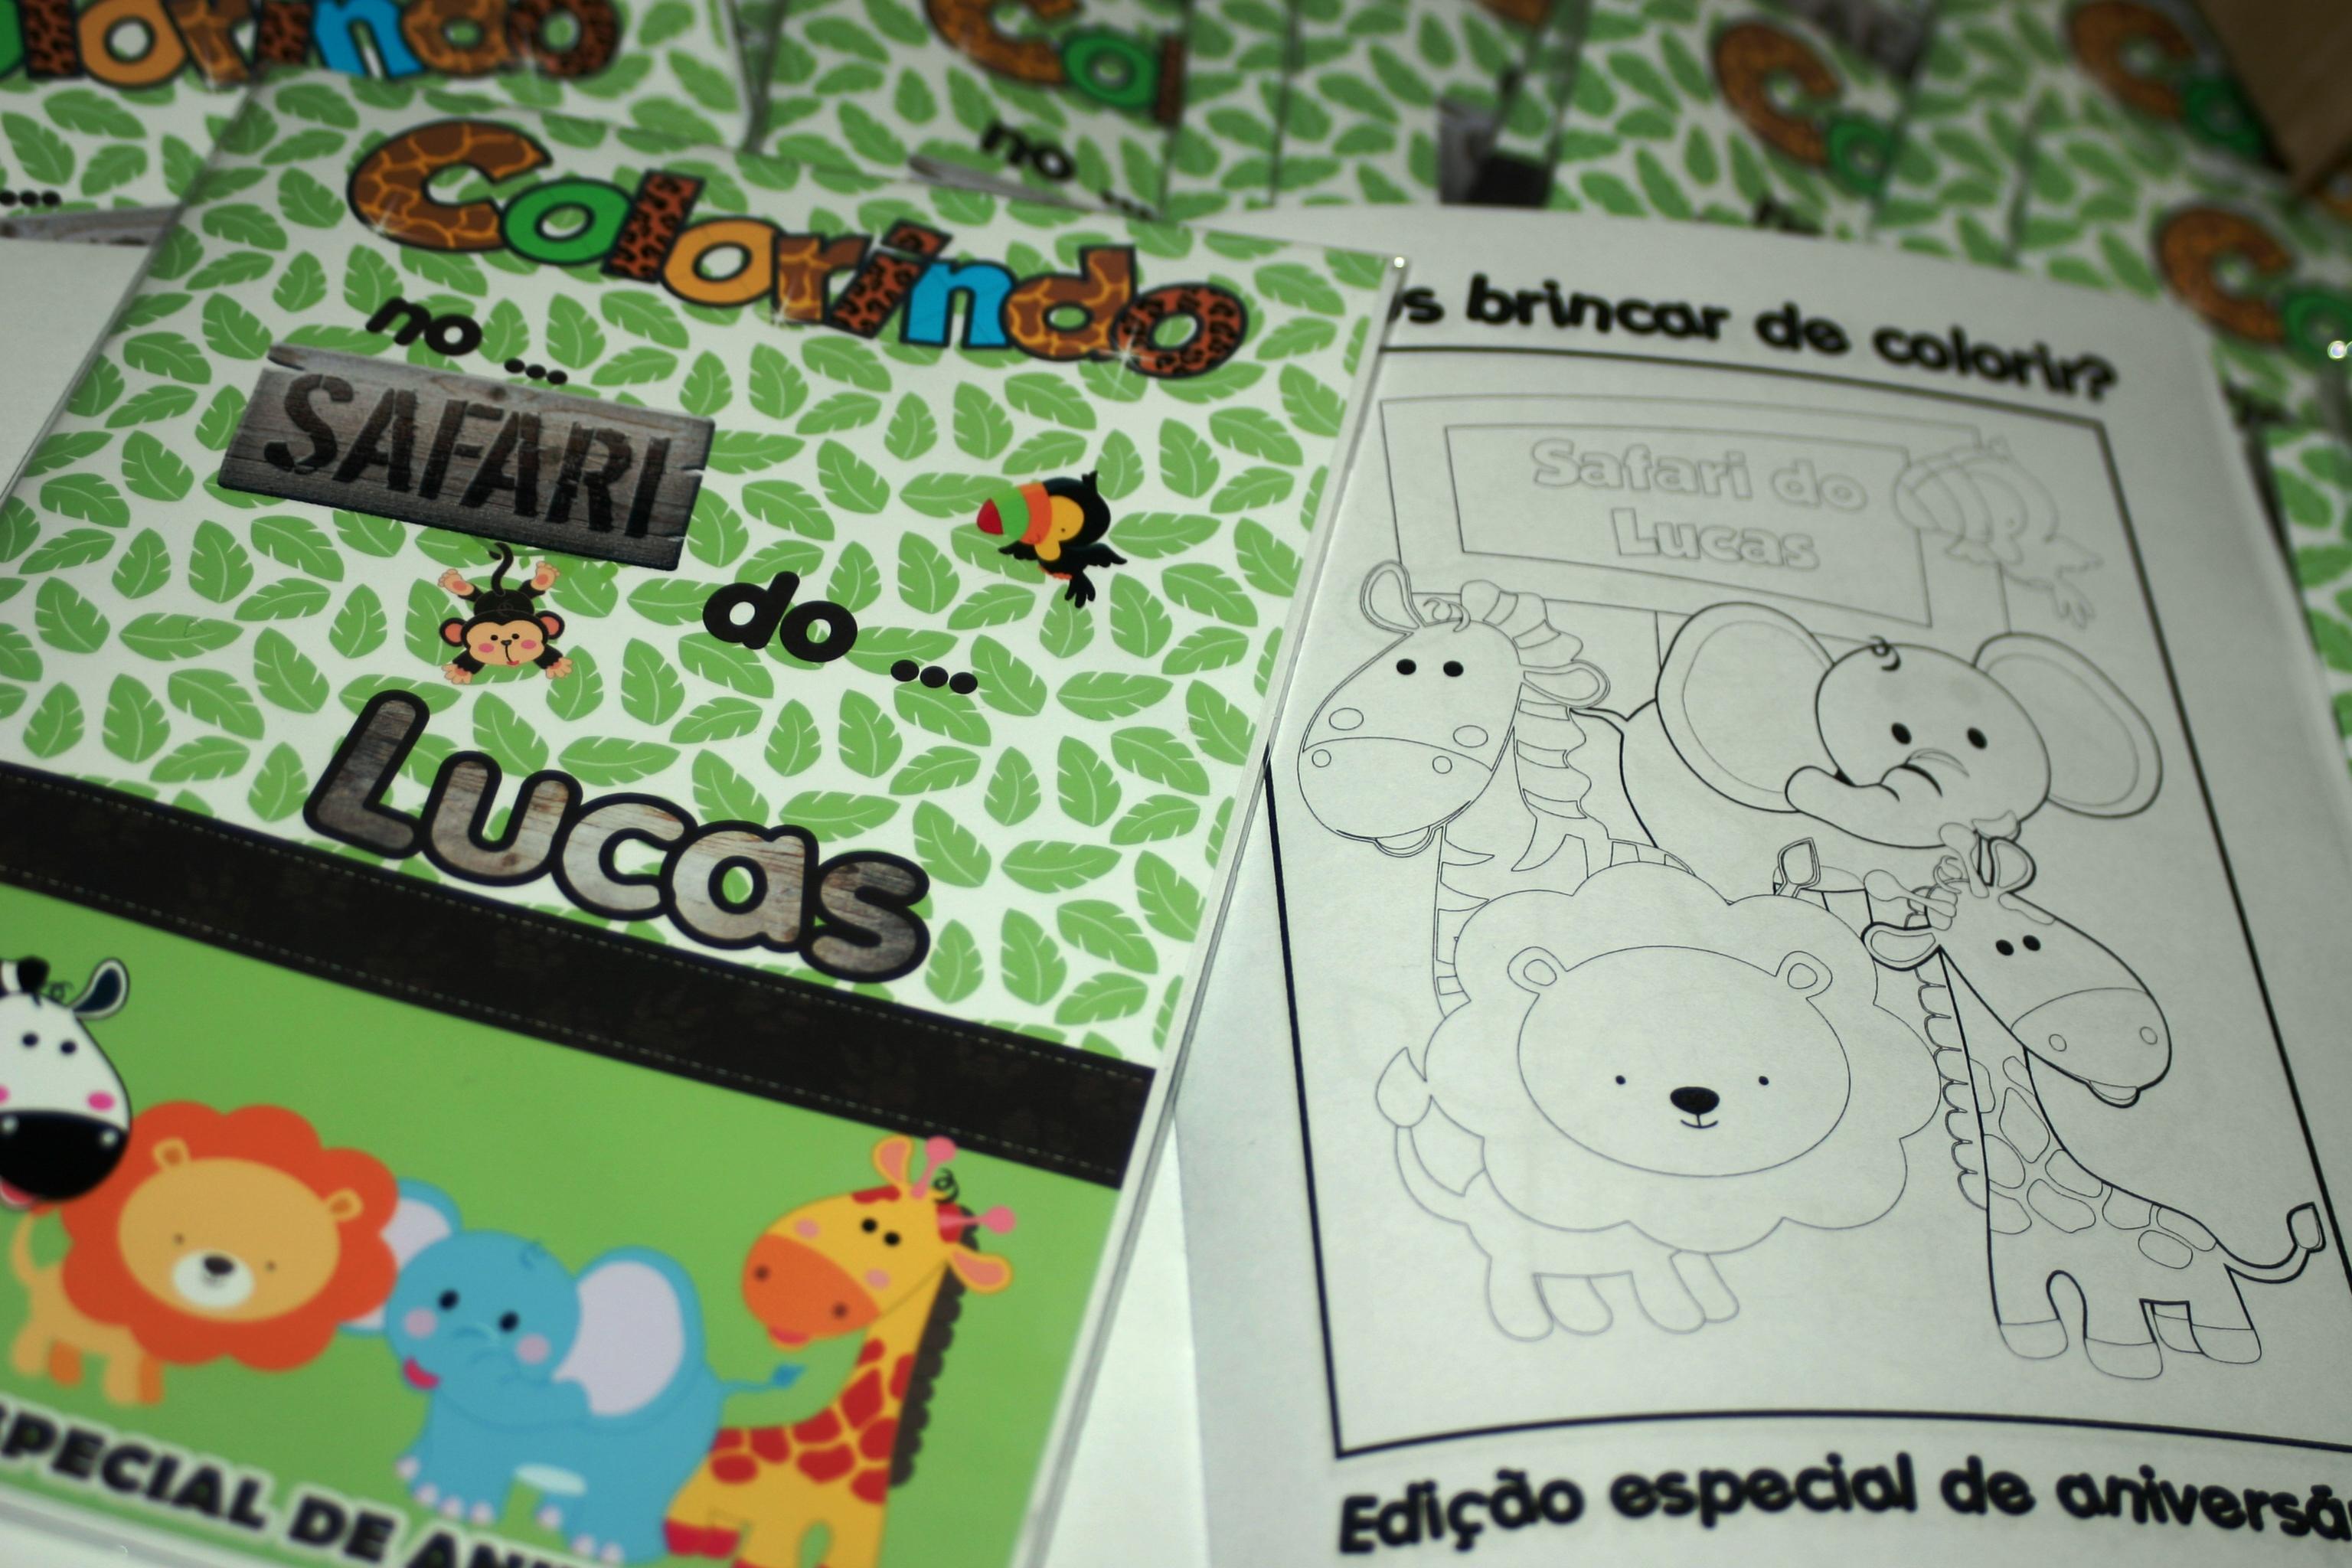 Revista Colorir Safari No Elo7 Seculus Lembrancinhas 44959d